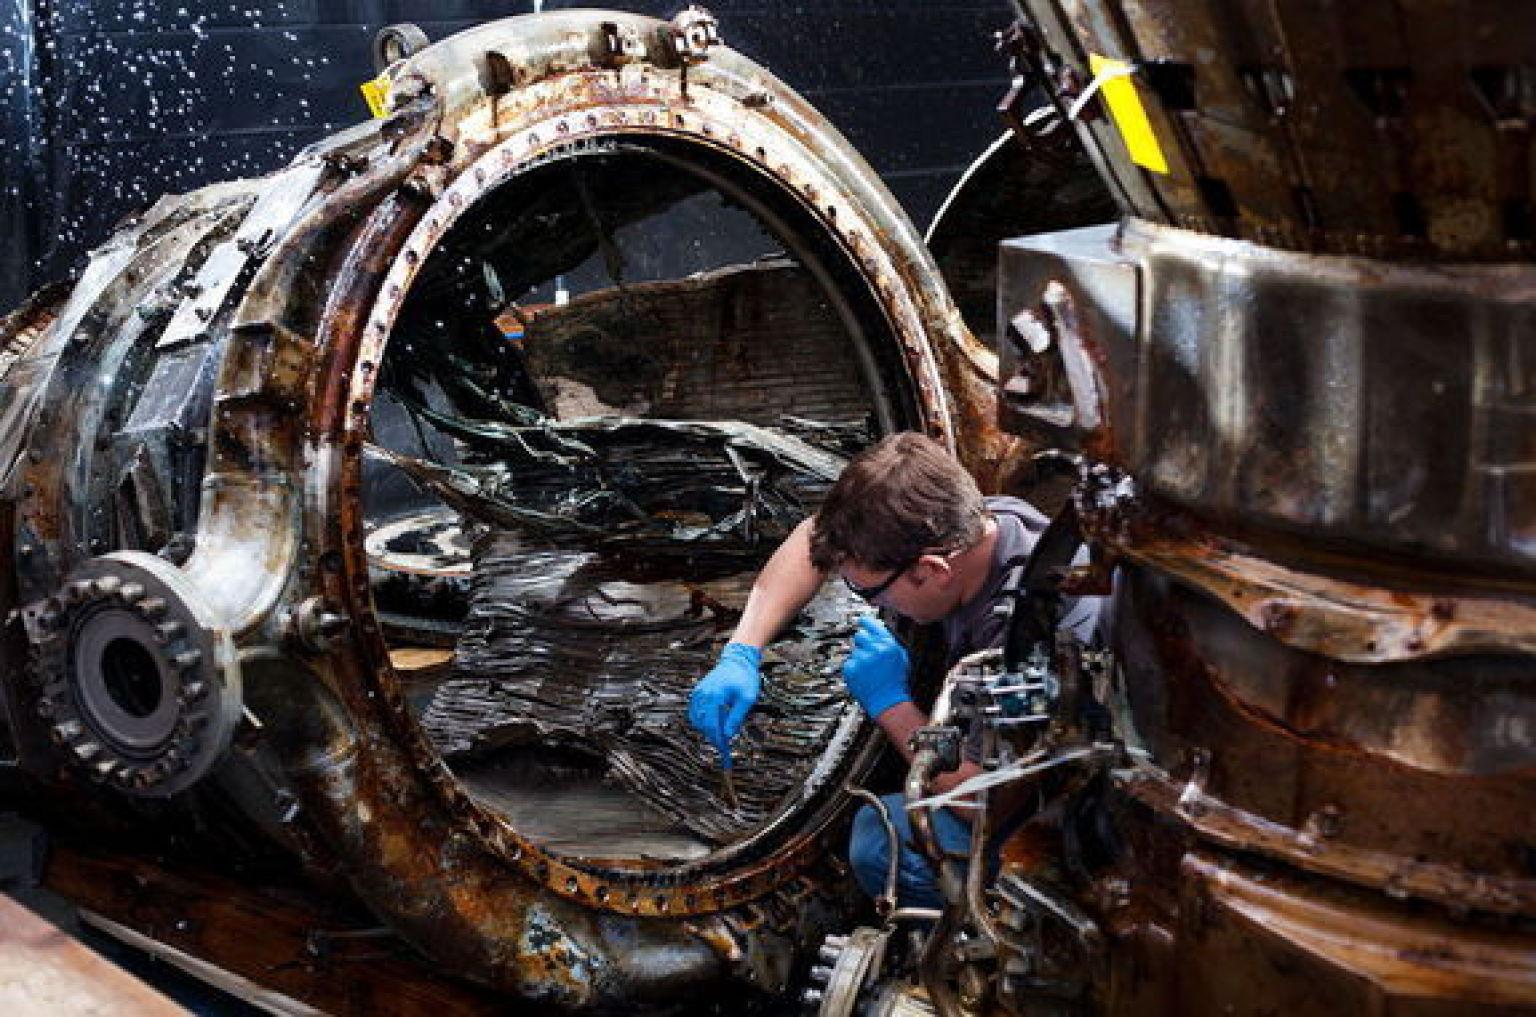 Apollo 11 Rocket Engine Part Recovered, Confirms Amazon ...